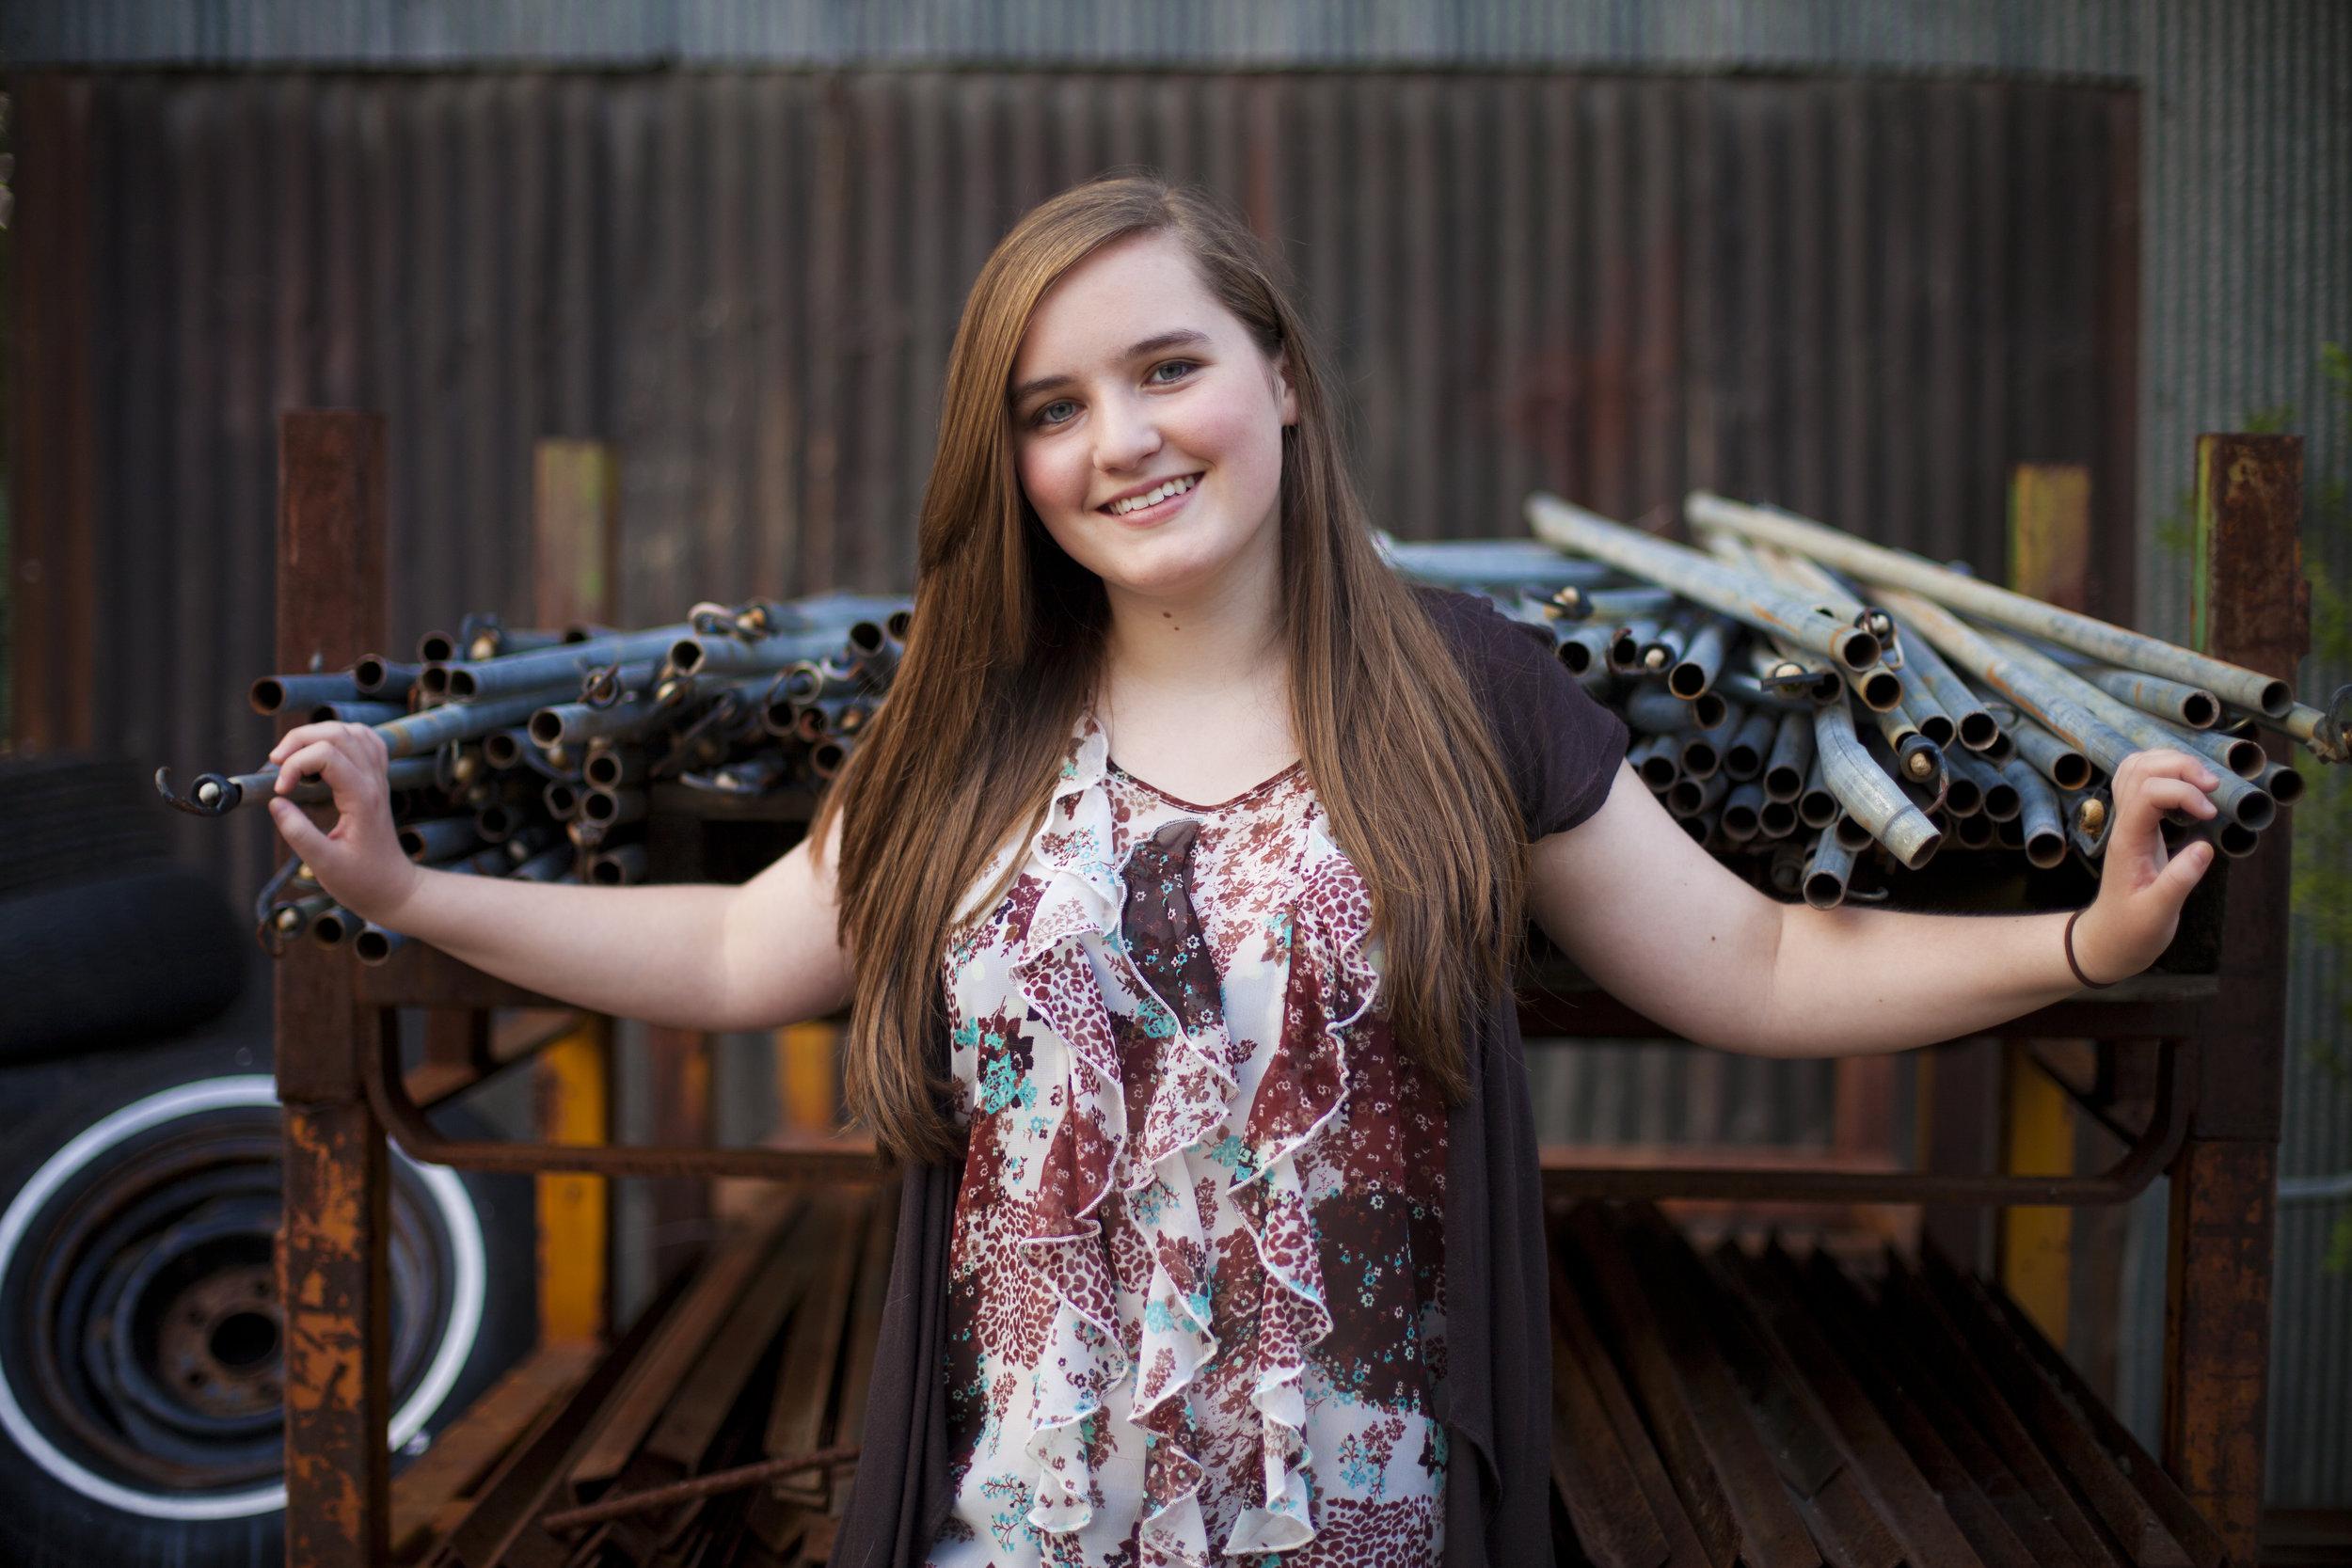 girl wearing white ruffle shirt standing by metal pipes senior photos